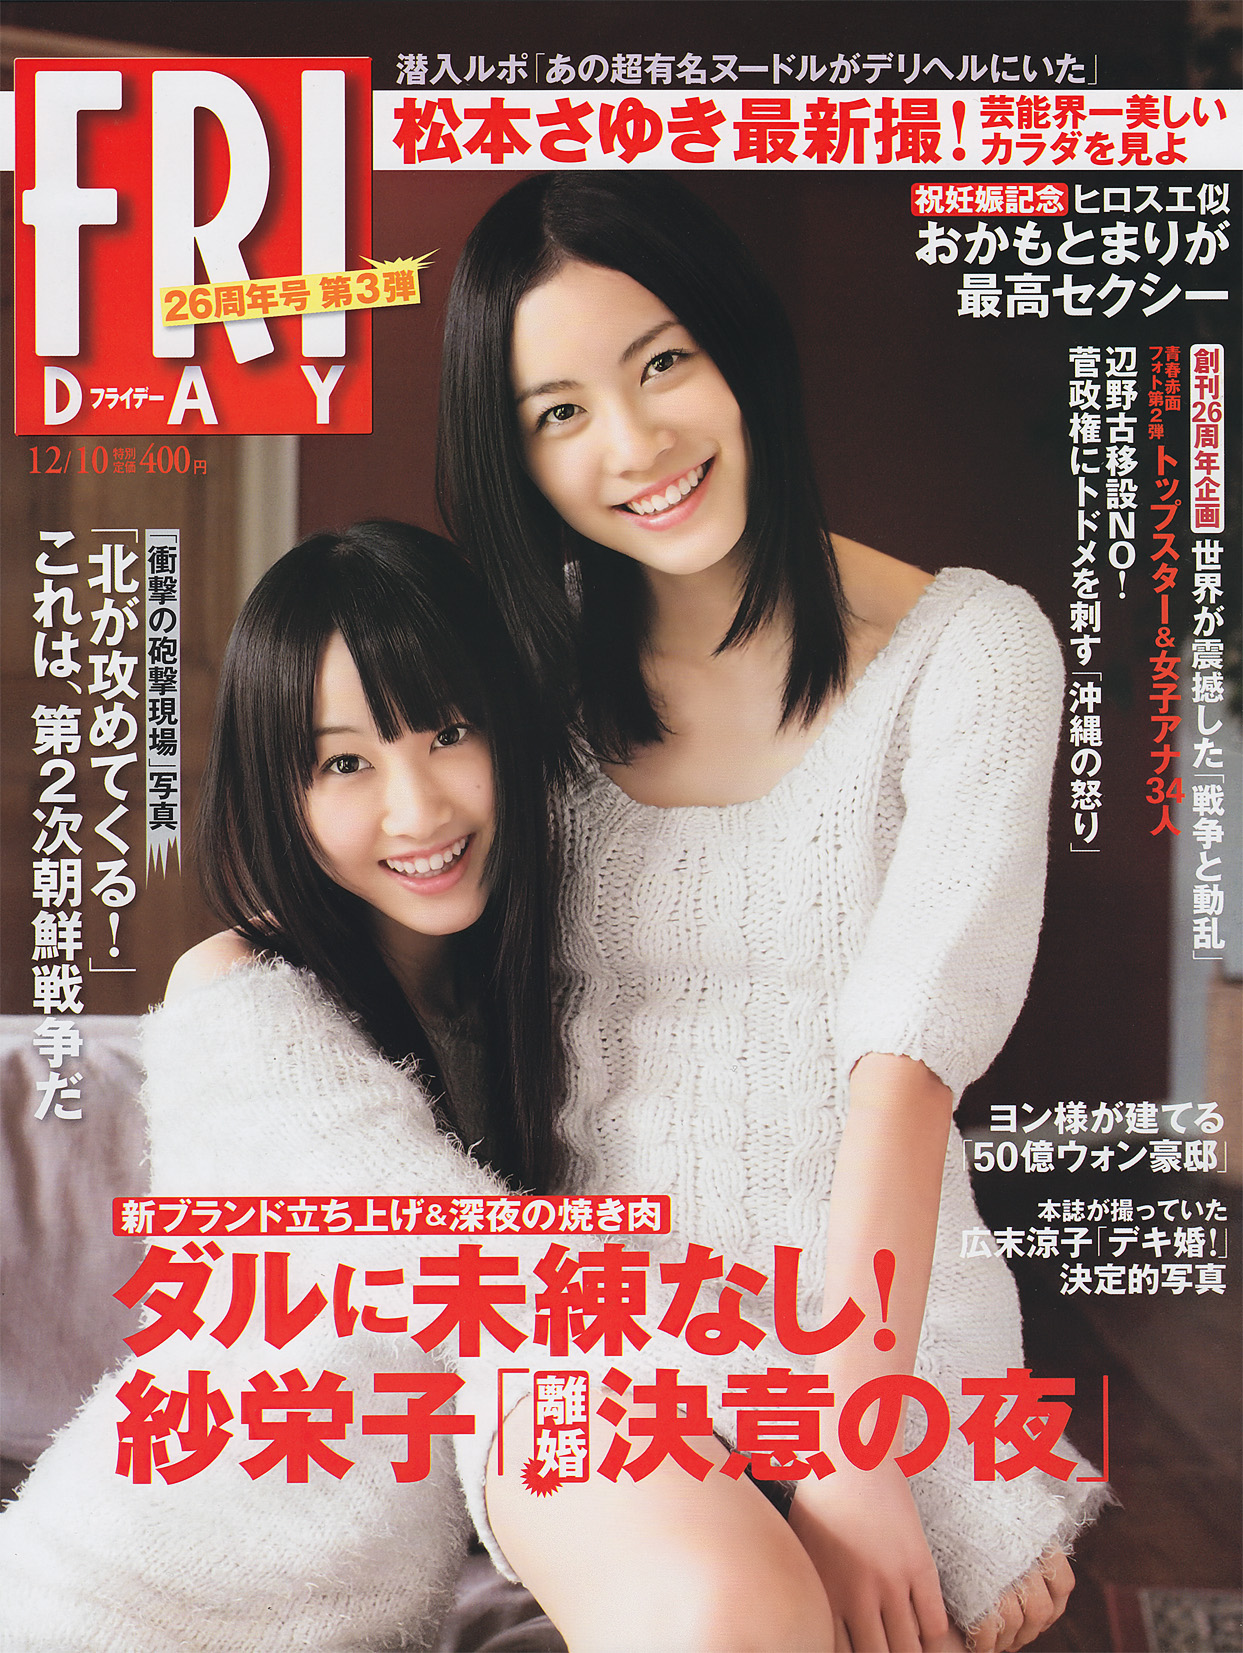 [FRIDAY] 2010.12.10 Jurina Matsui 松井珠理奈 & Rena Matsui 松井玲奈 [39P22MB] 08180